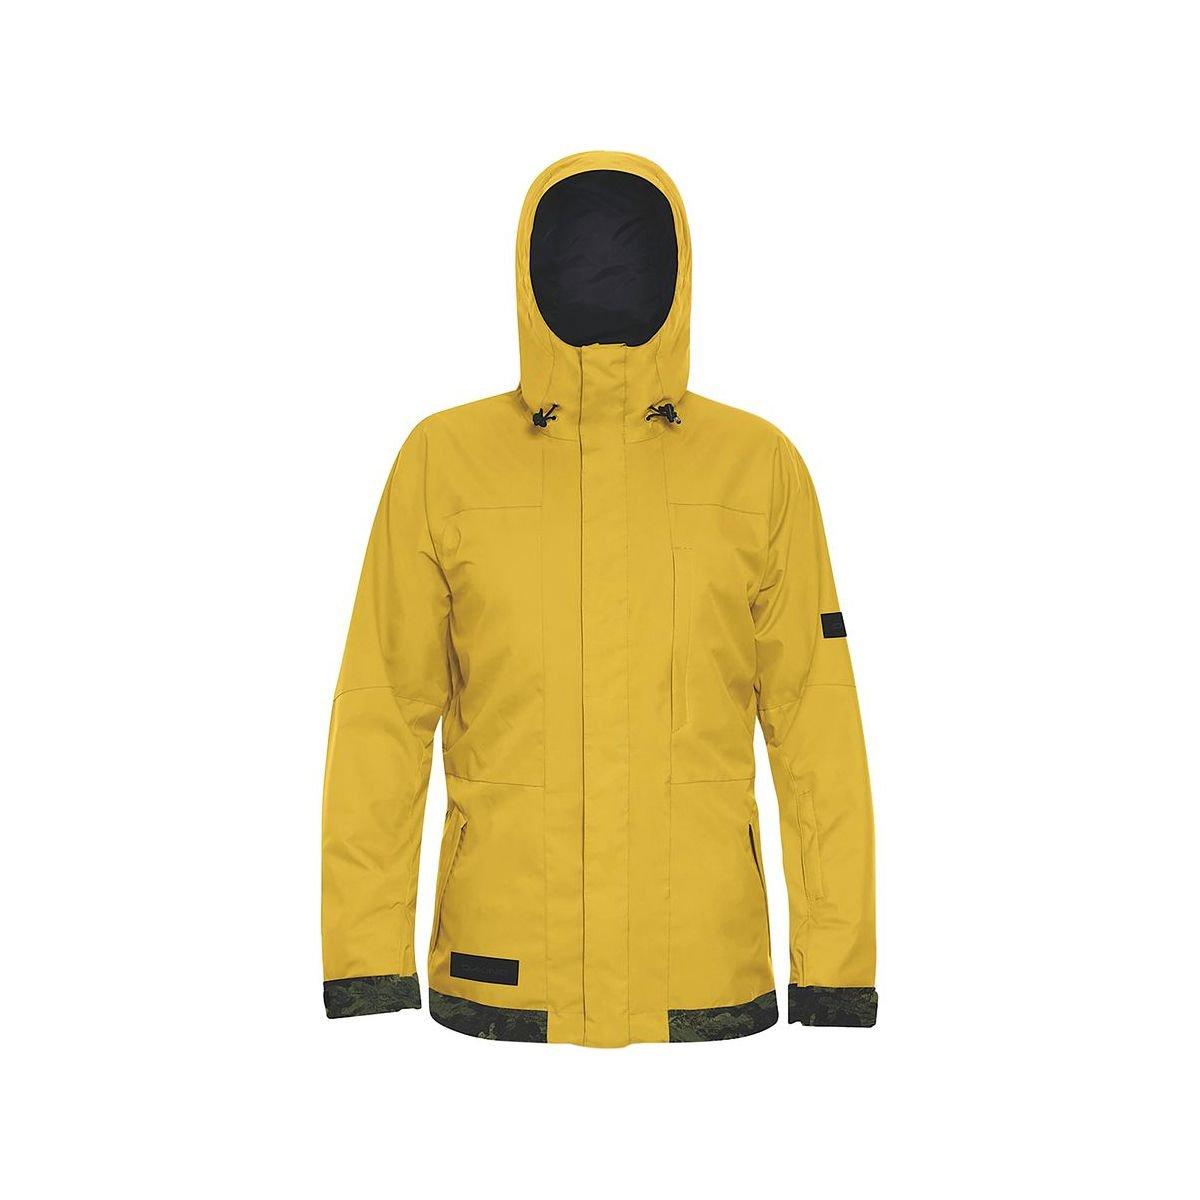 Da Kine Incline Jacket Curryptcmo Gr L günstig kaufen